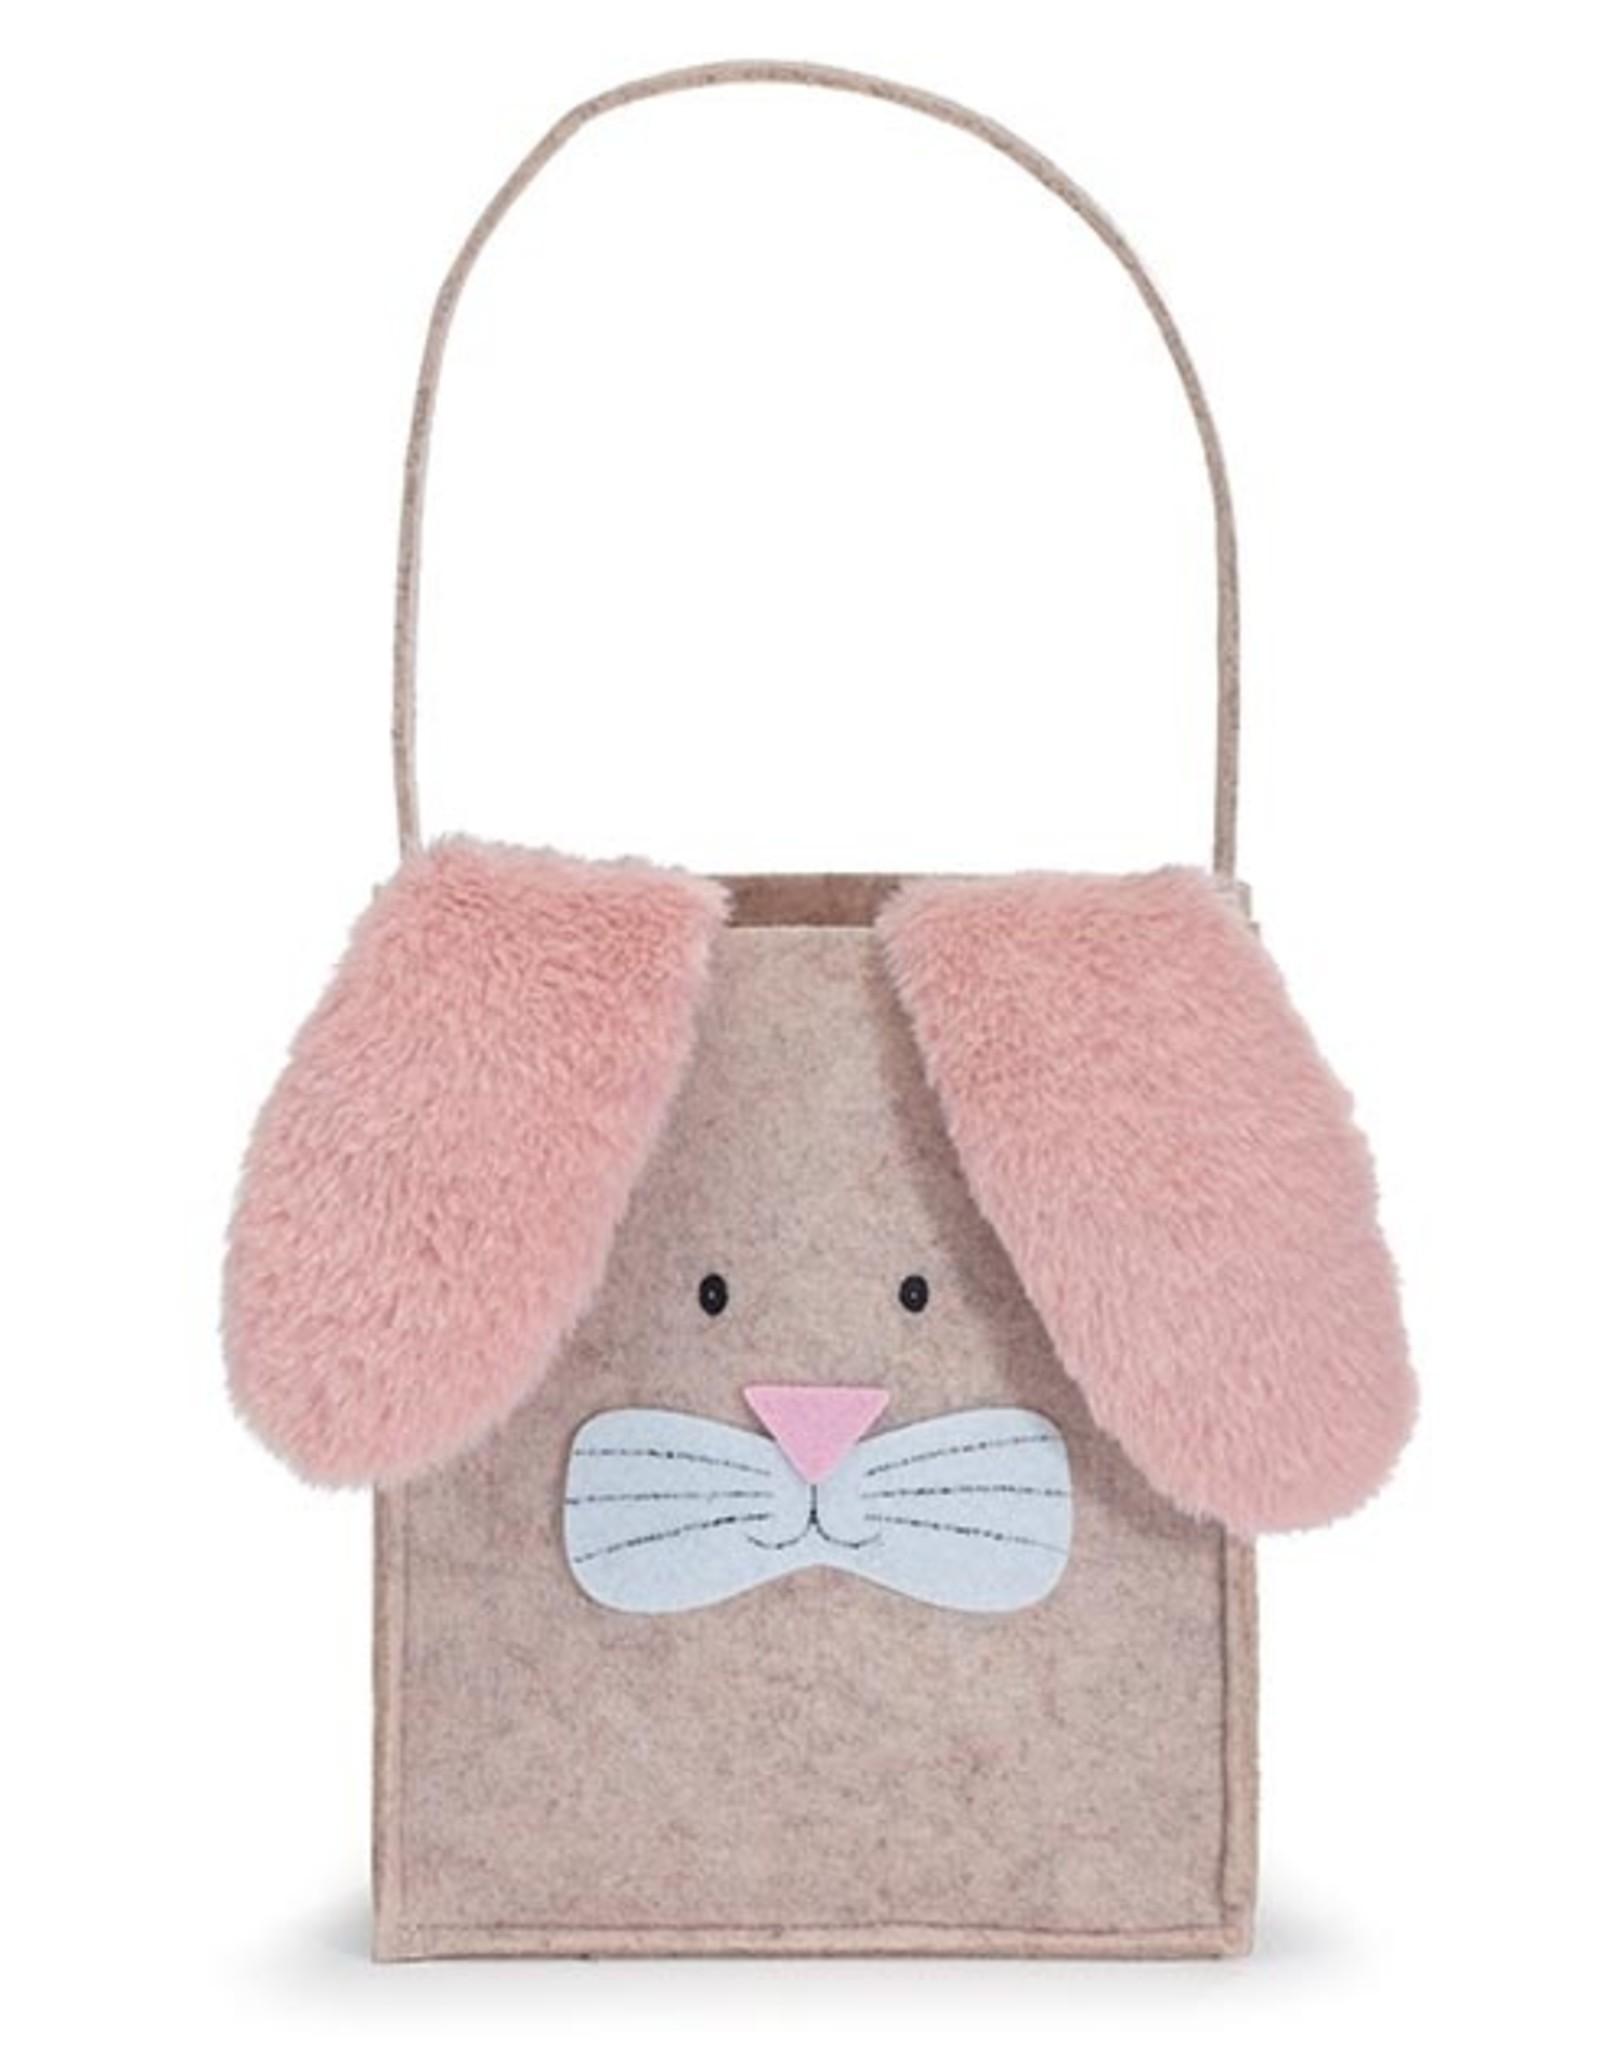 Burton & Burton Large Felt Easter Bunny Bag